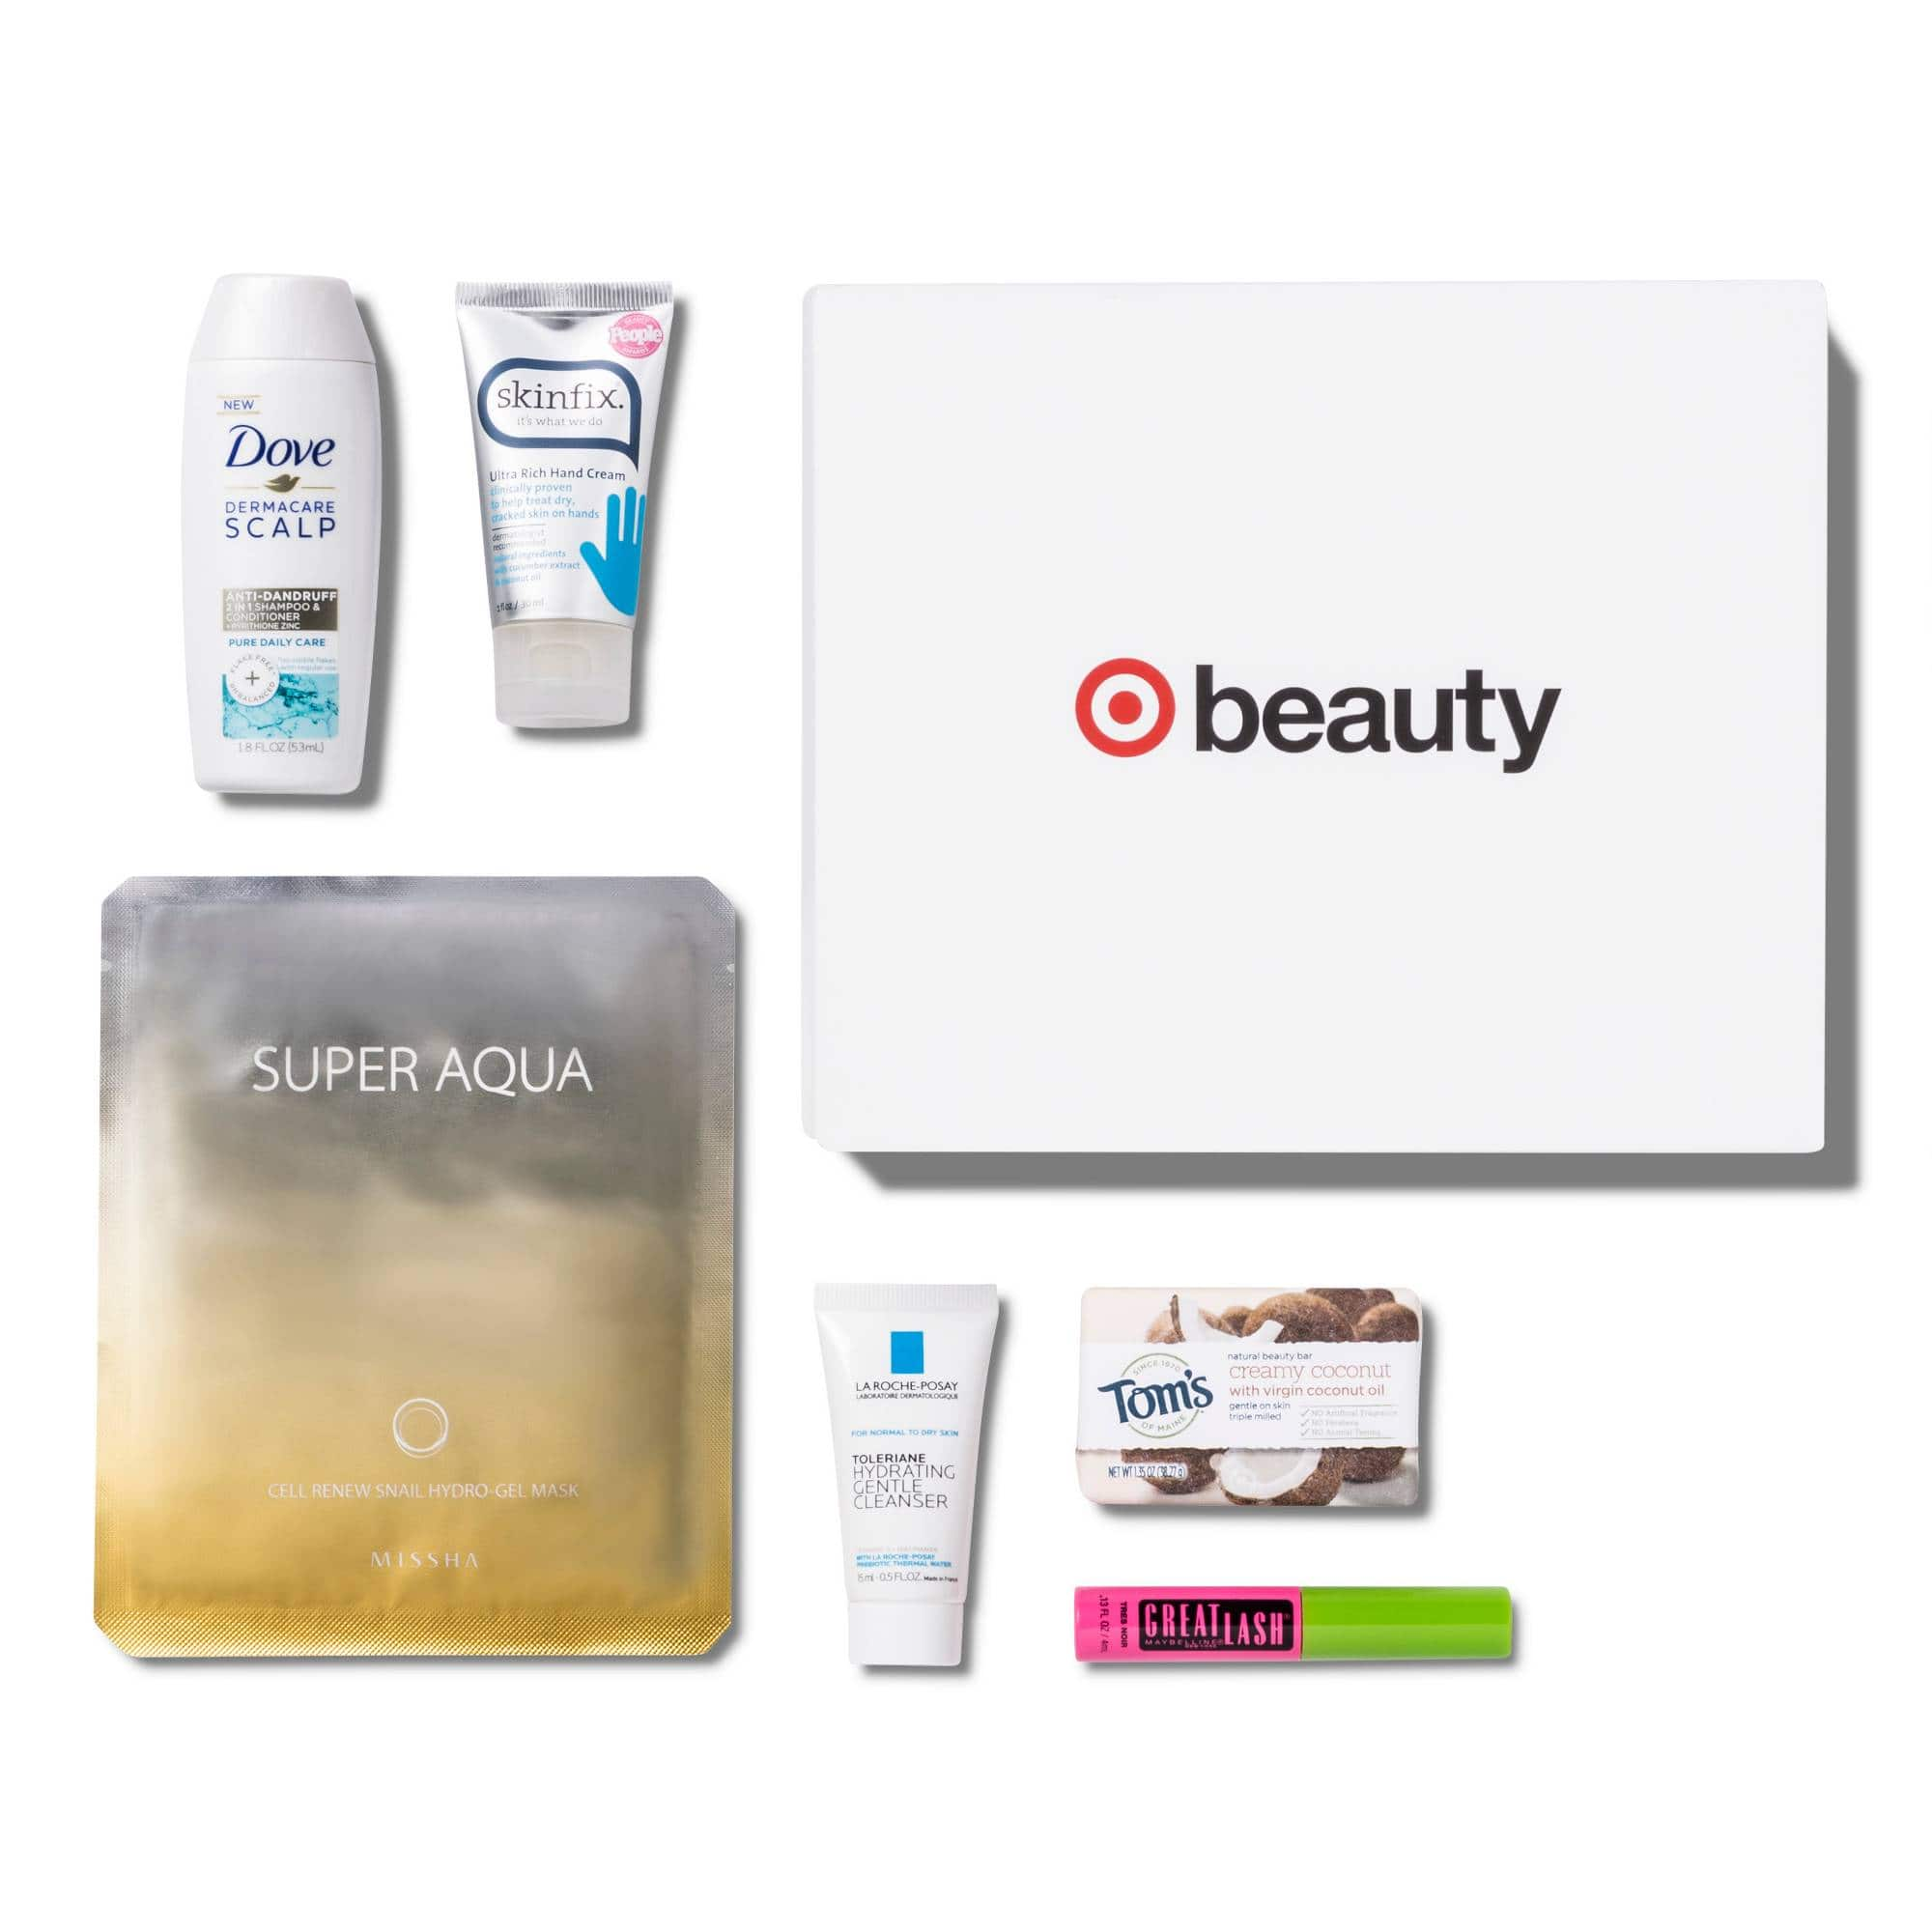 Target November Beauty Box $7